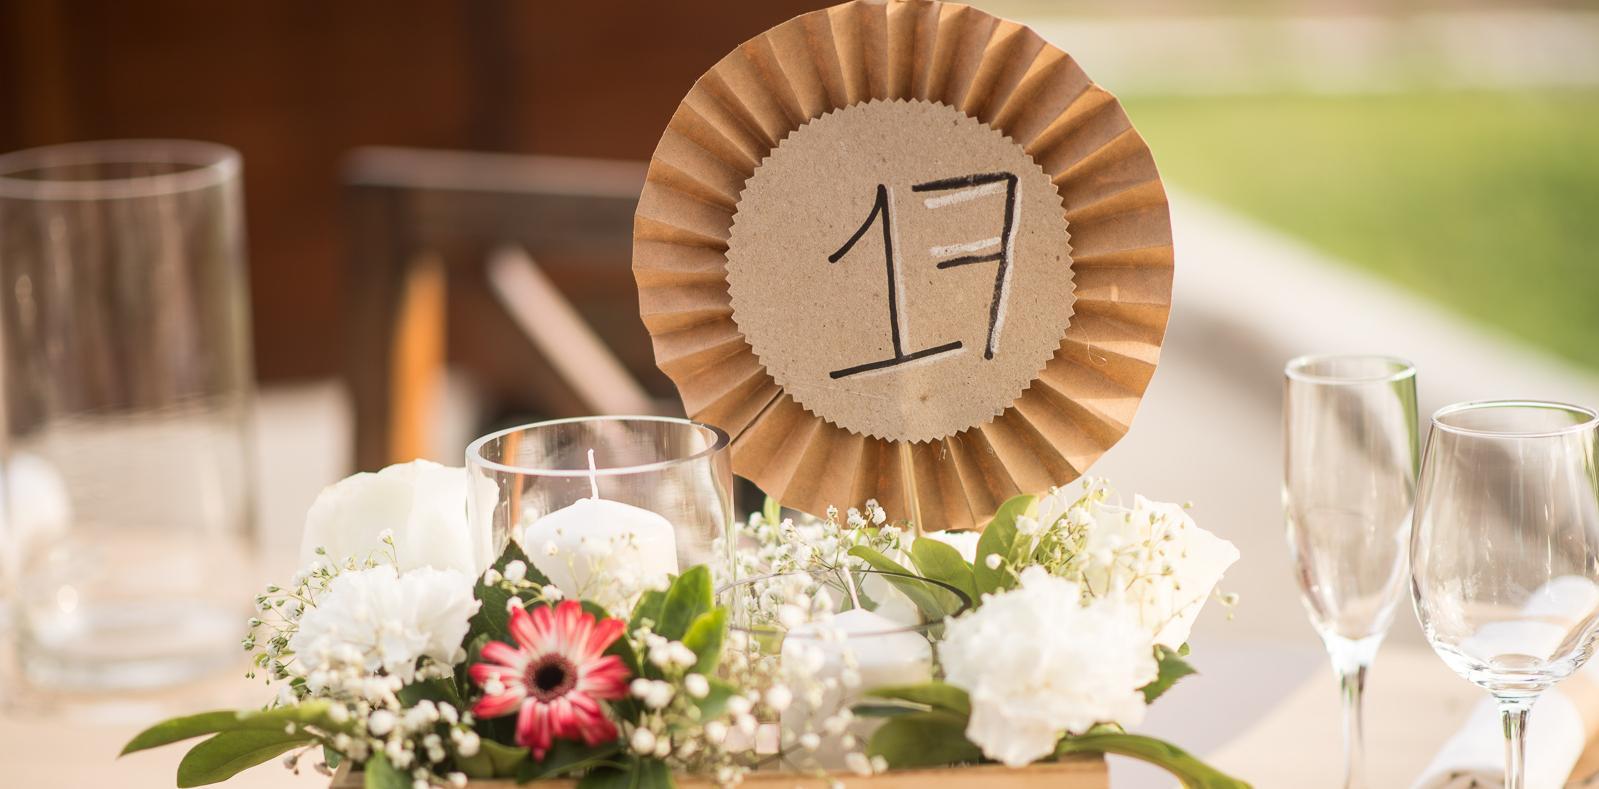 bodas-estilo-libre-jardin-cuba-8912.jpg